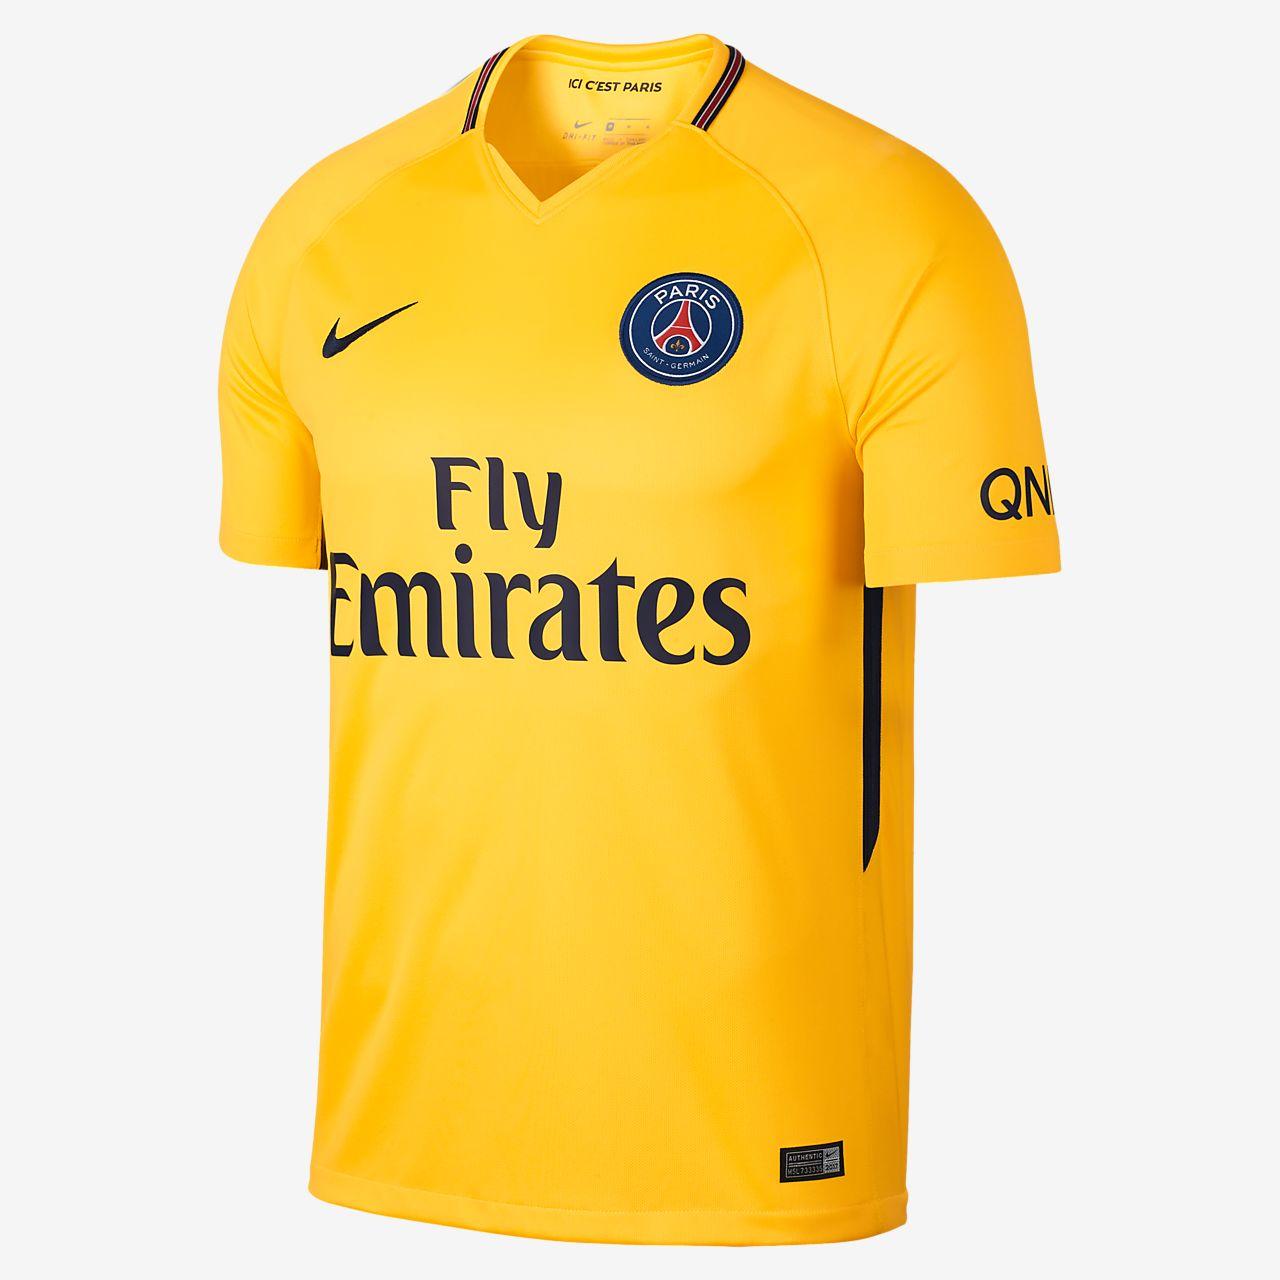 comprar camiseta Paris Saint Germain modelos